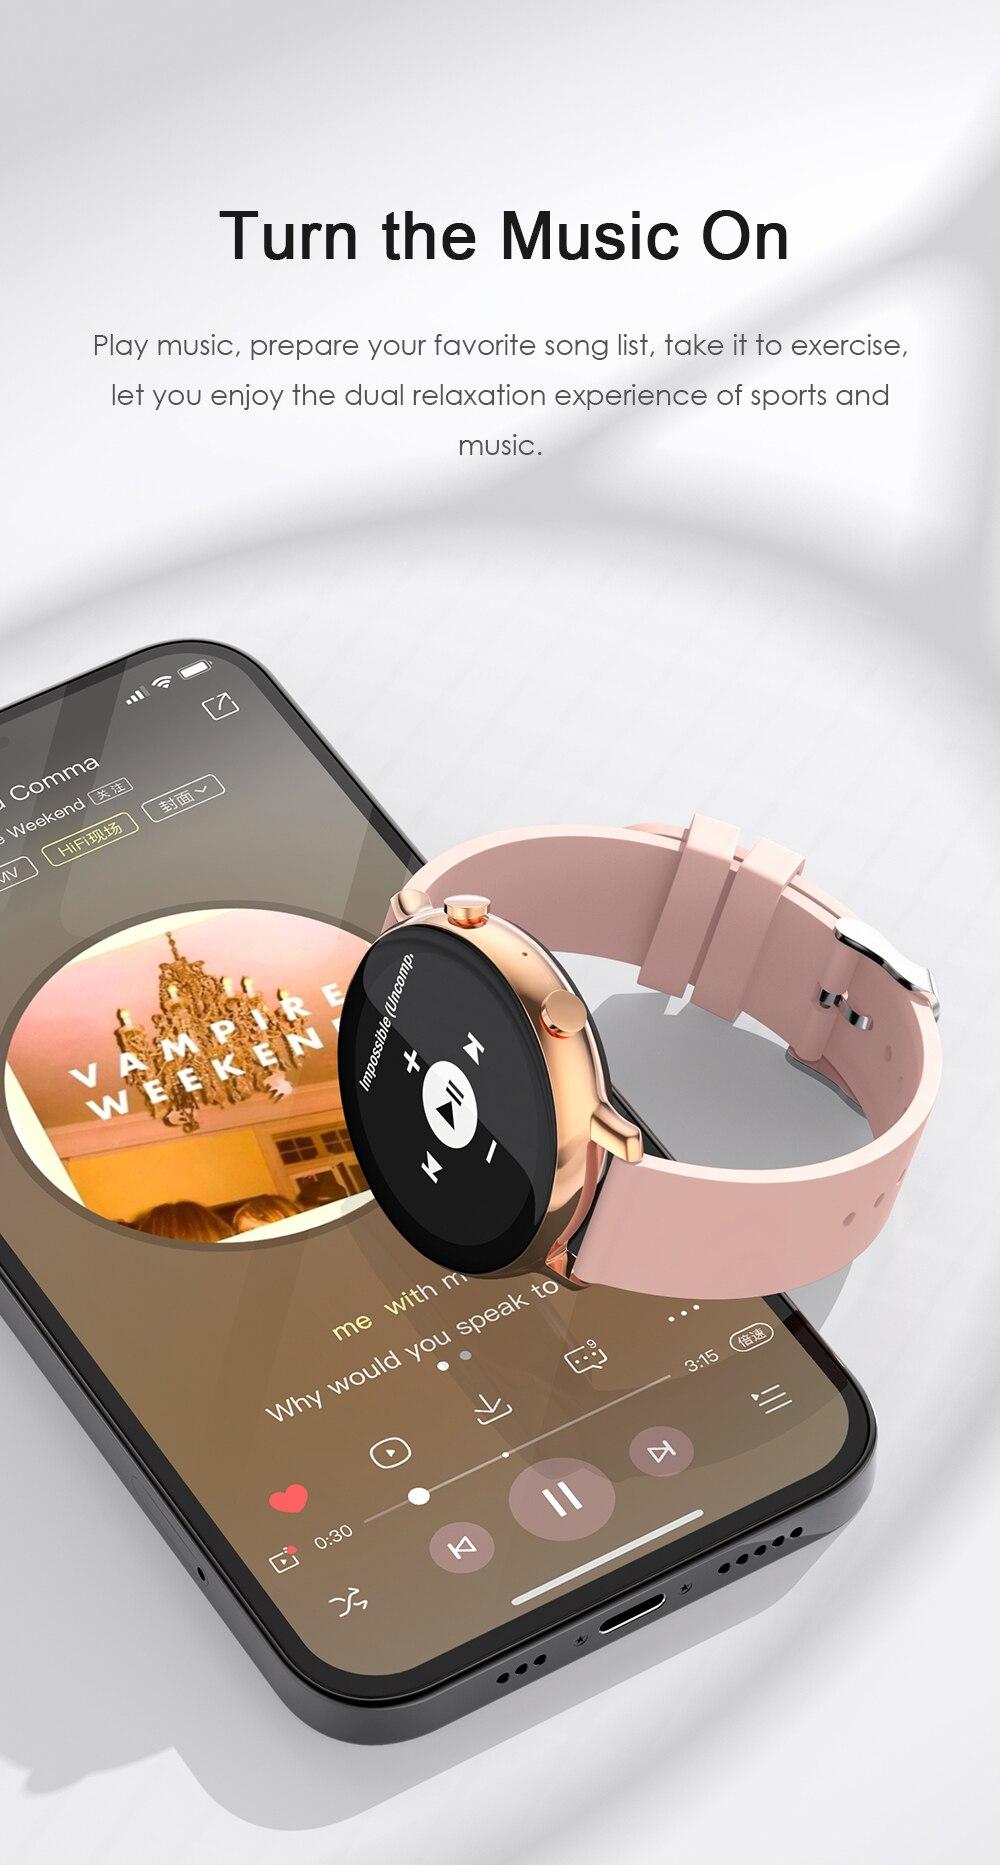 Ha78ba502d63541deb63435c64e3a4cb94 SANLEPUS 2021 Smart Watch Dial Calls Men Women Waterproof Smartwatch ECG PPG Fitness Bracelet Band For Android Apple Xiaomi